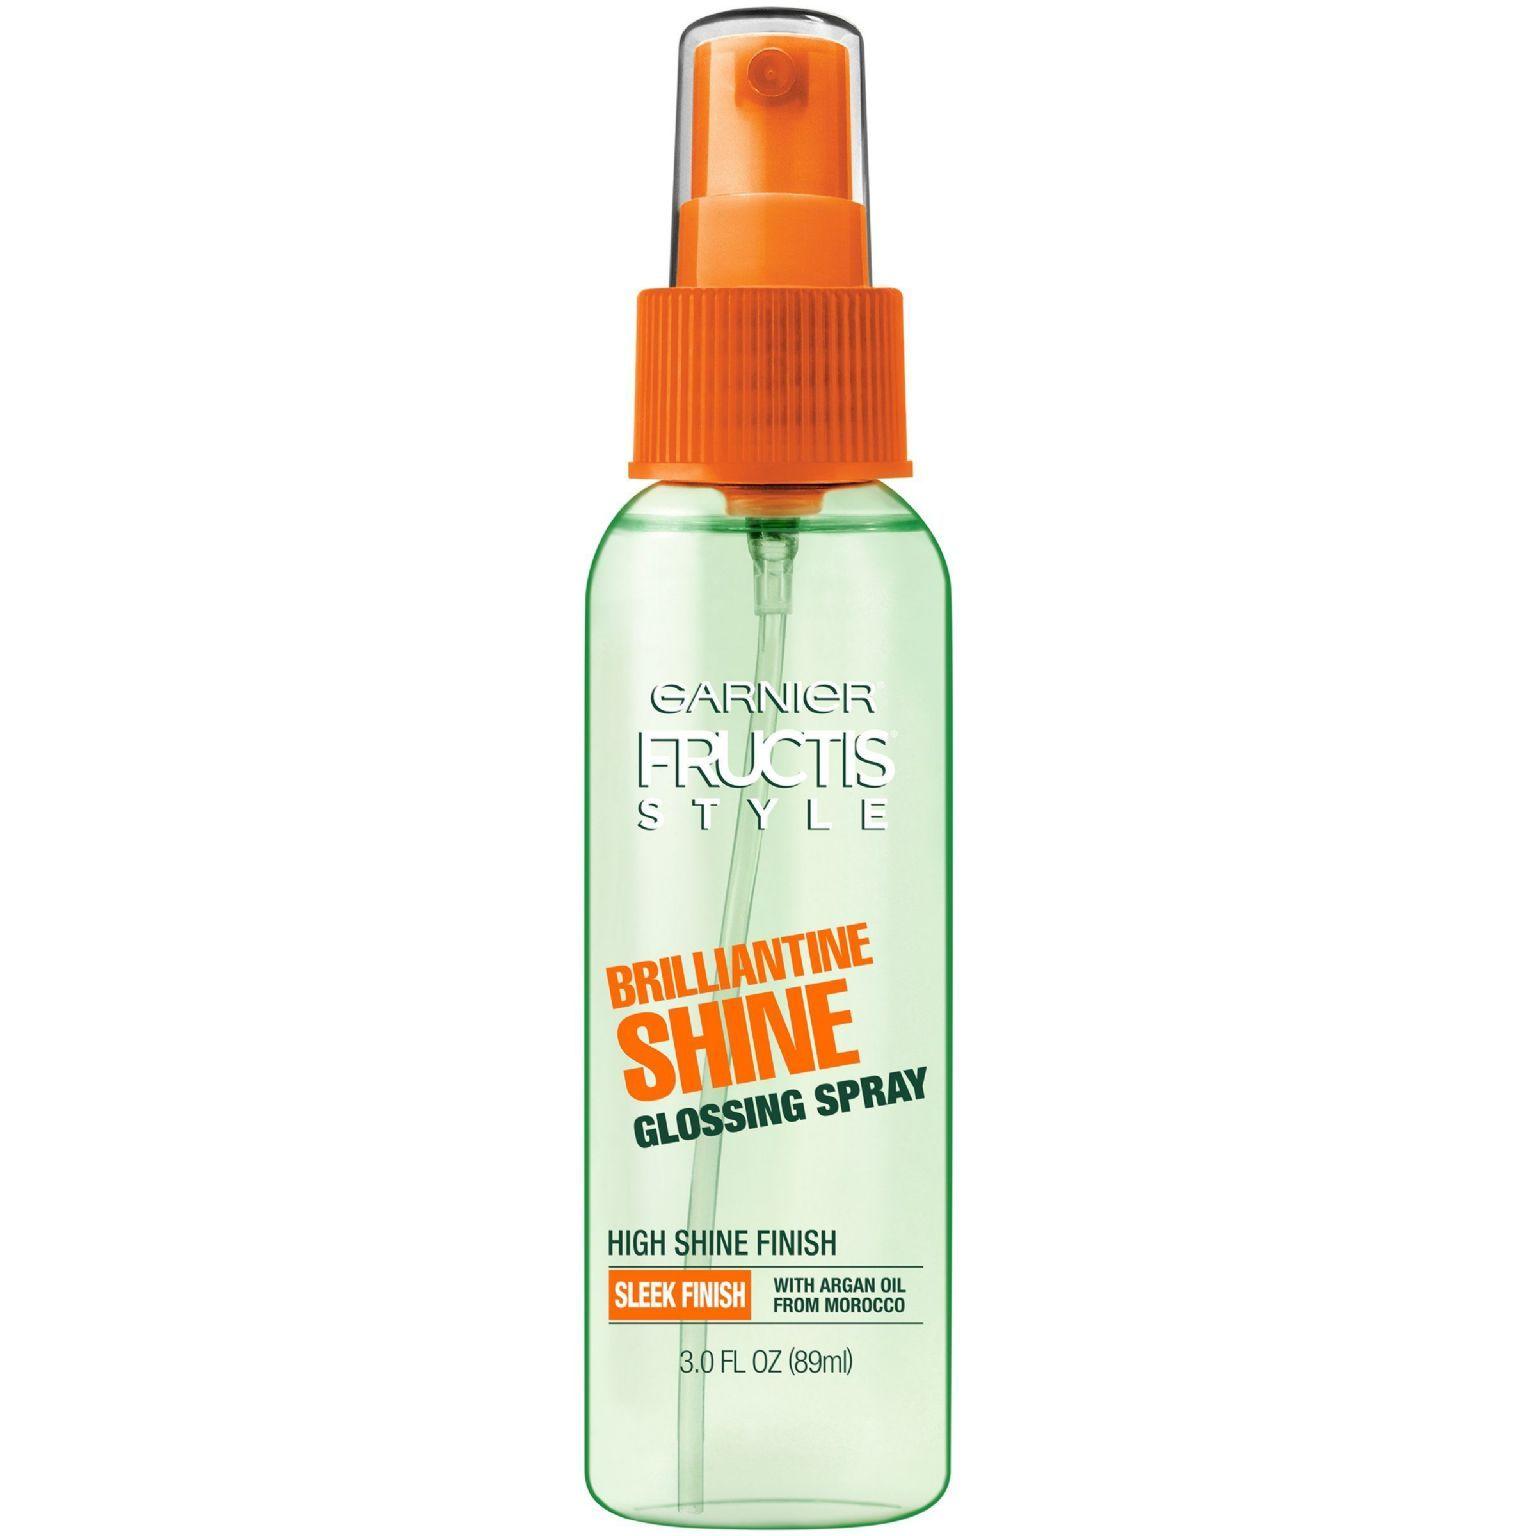 Brilliantine Shine Glossing Spray